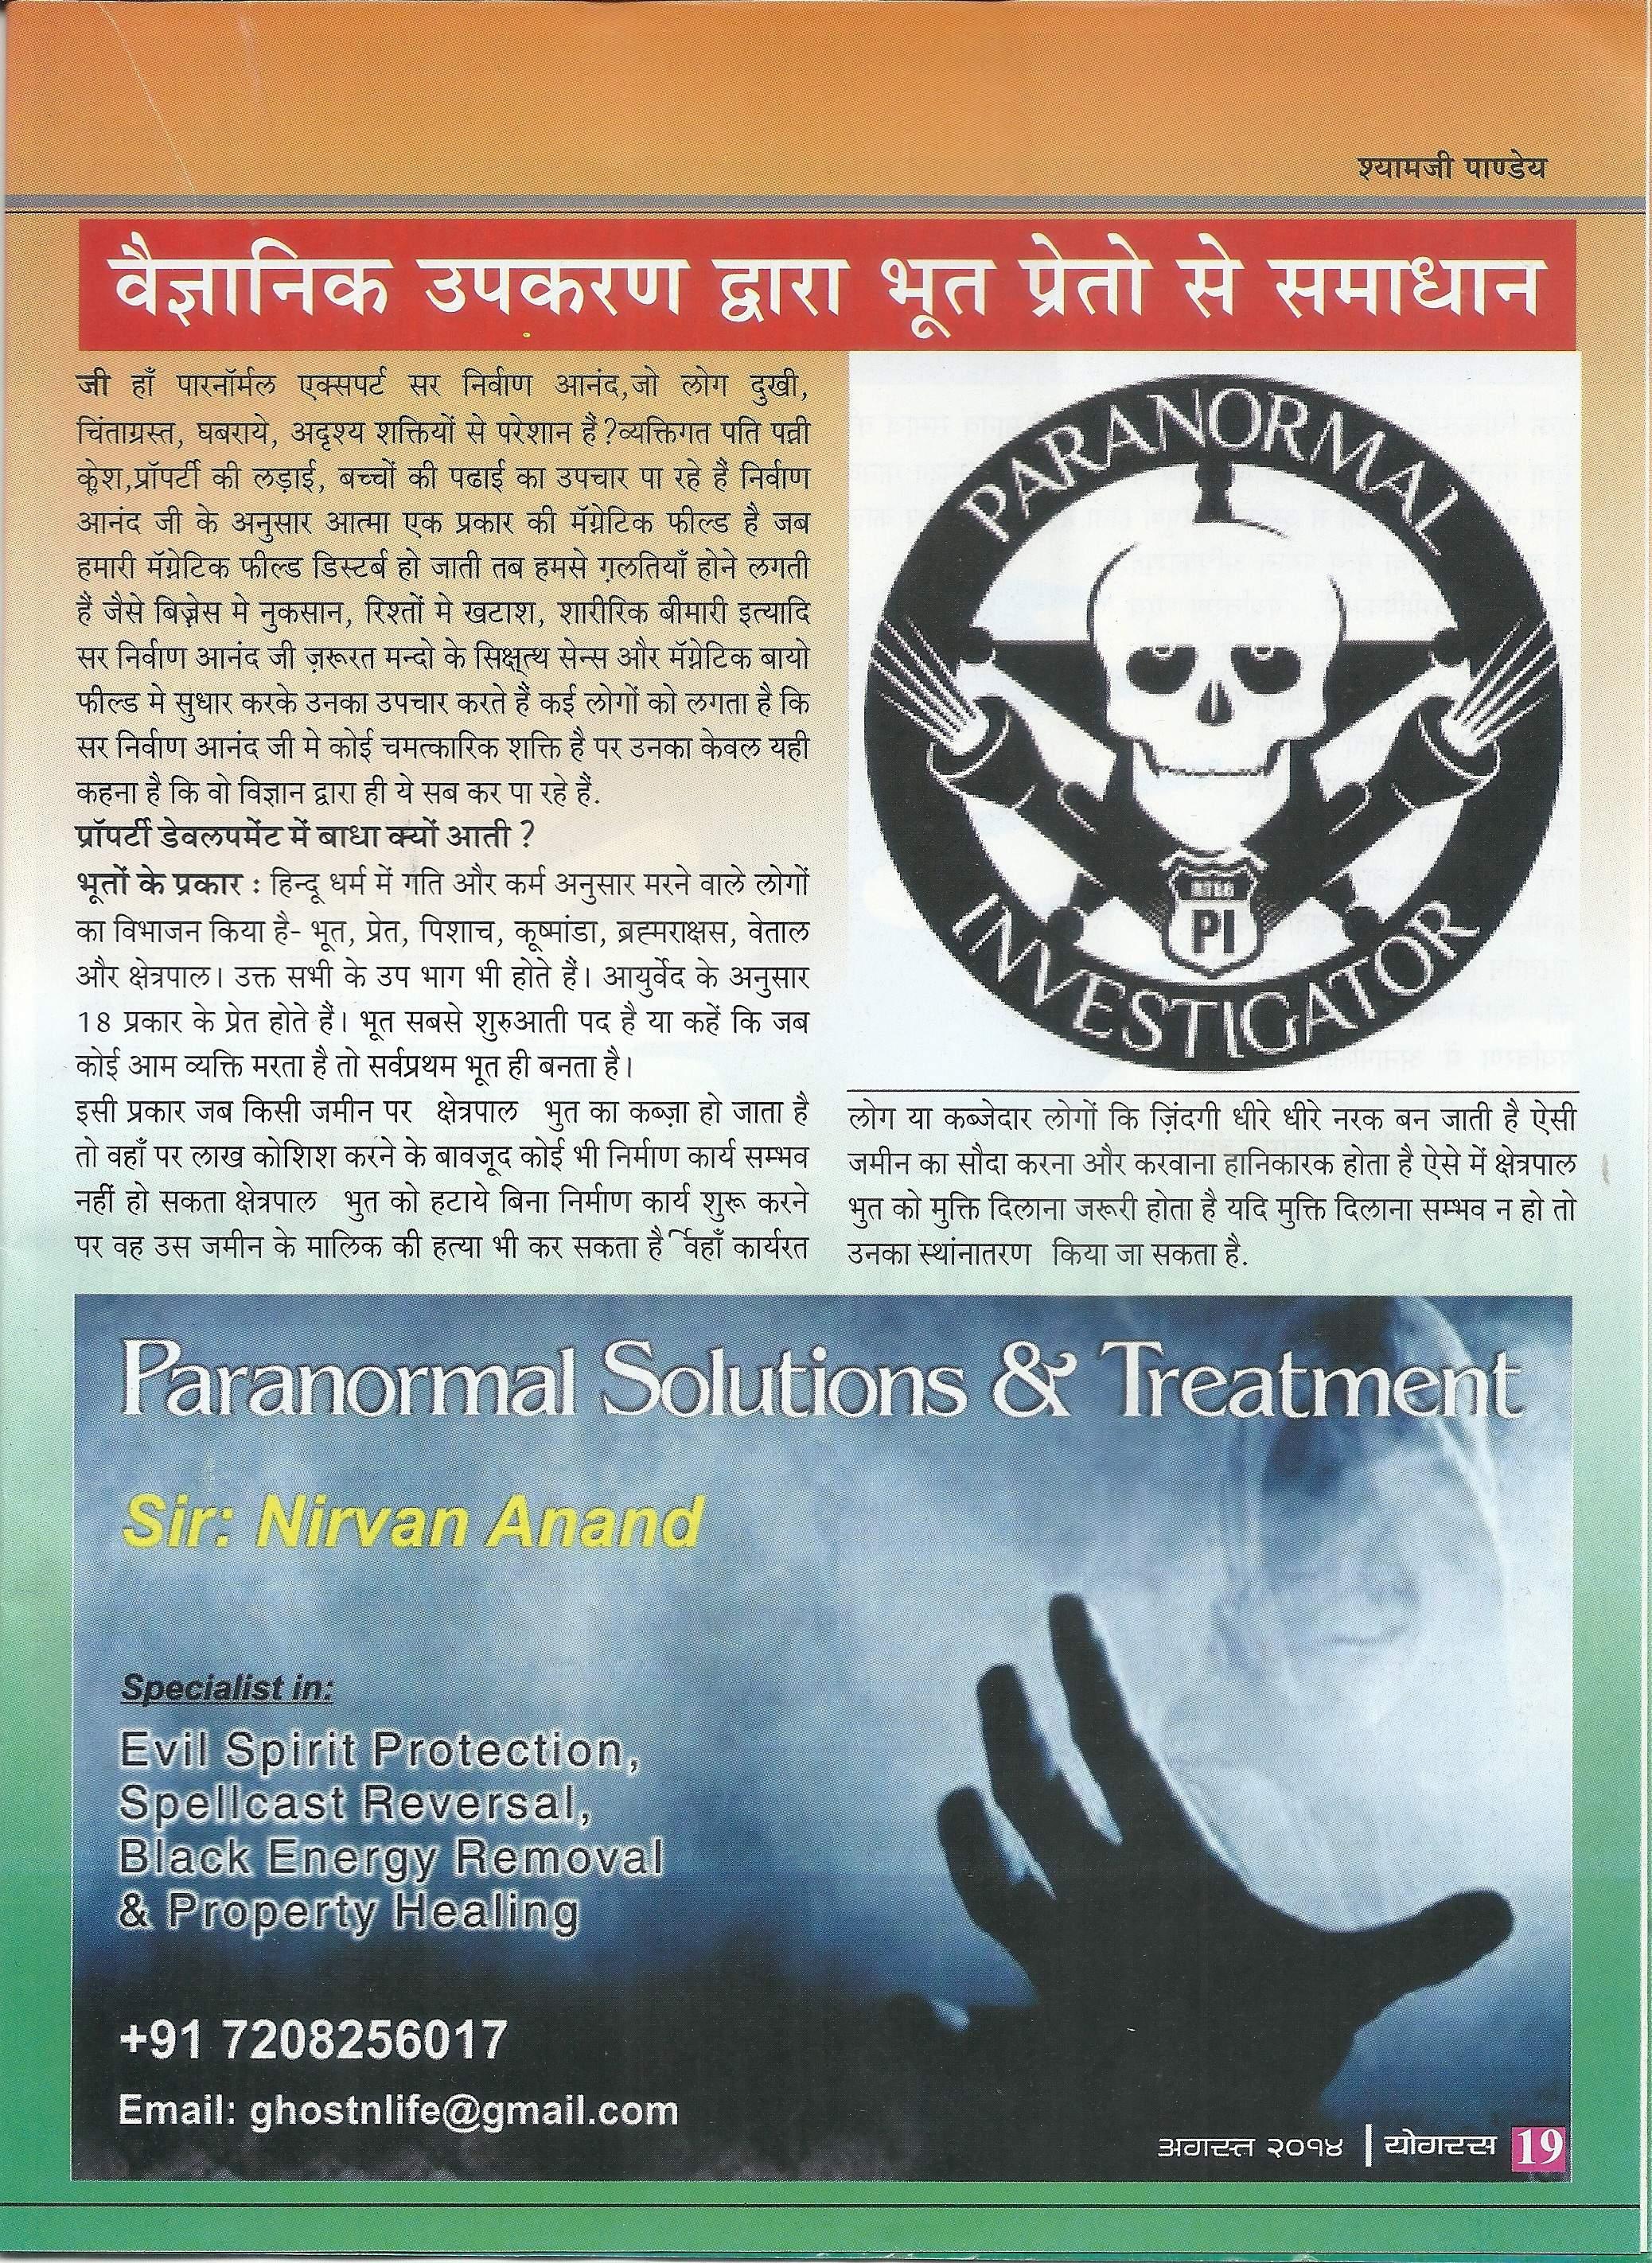 SIr Nirvan Anand Paranormal Expert